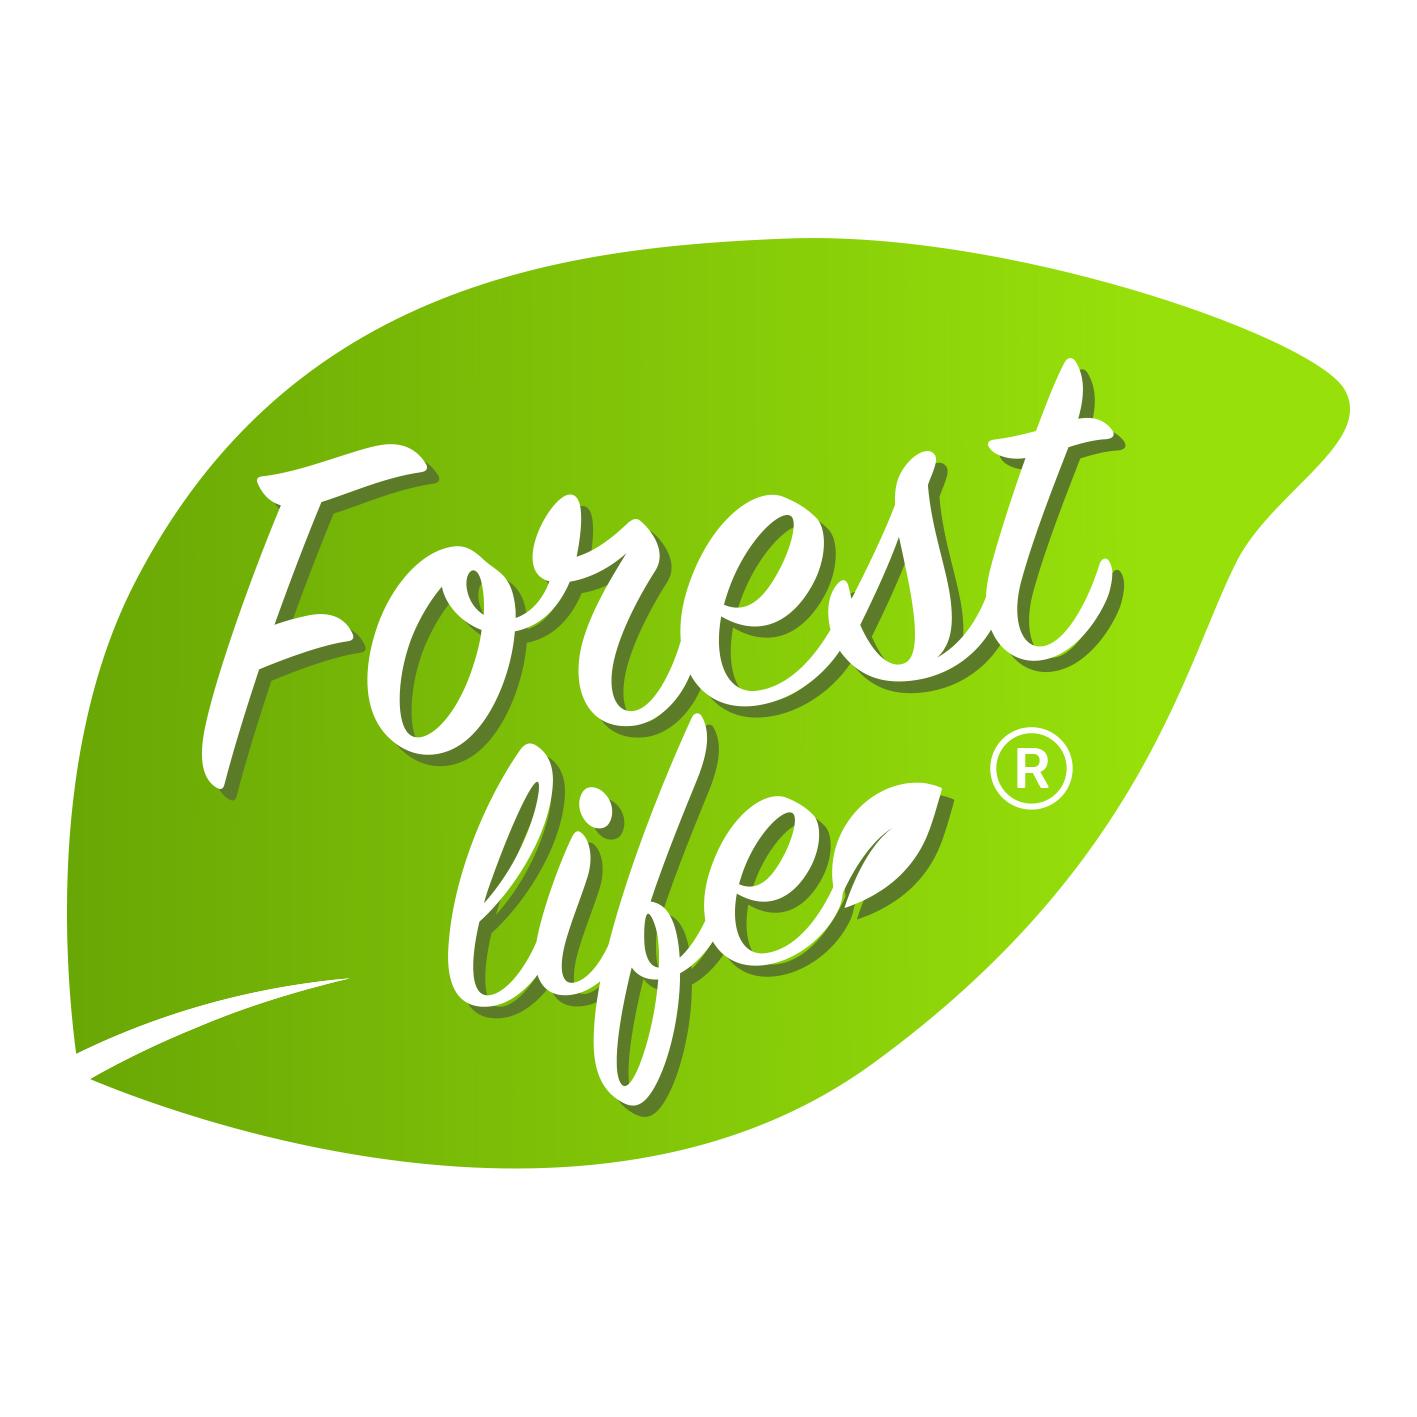 LOGO_FORESTLIFE03.jpg